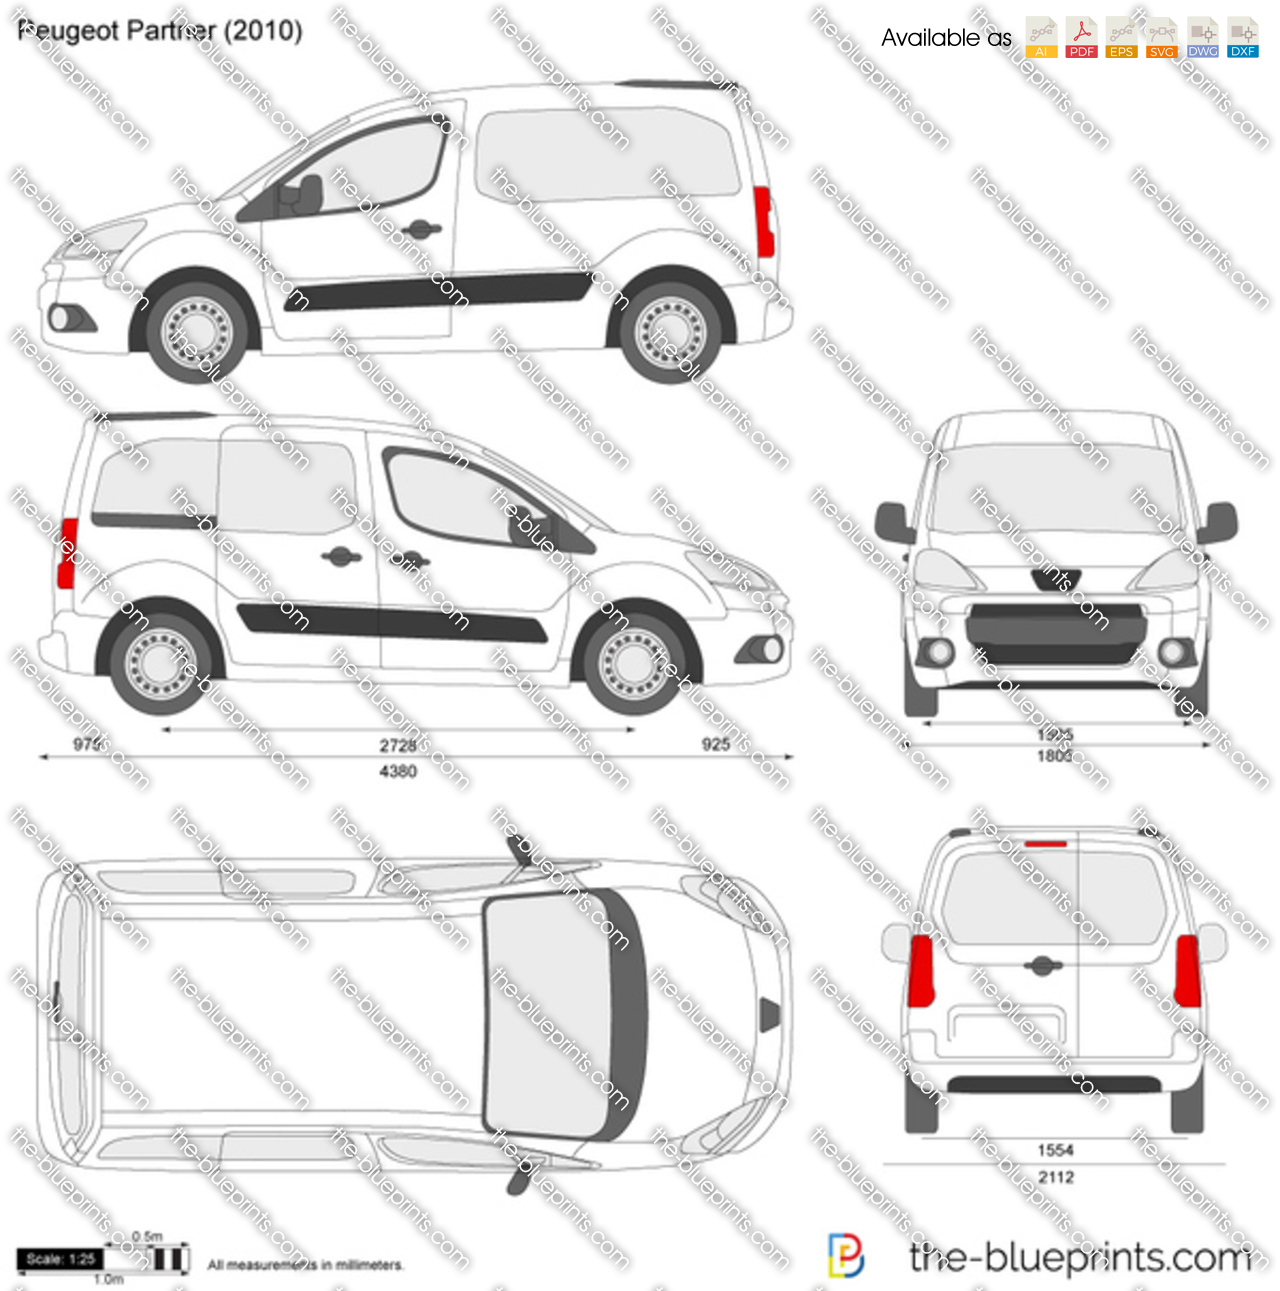 the-blueprints - vector drawing - peugeot partner